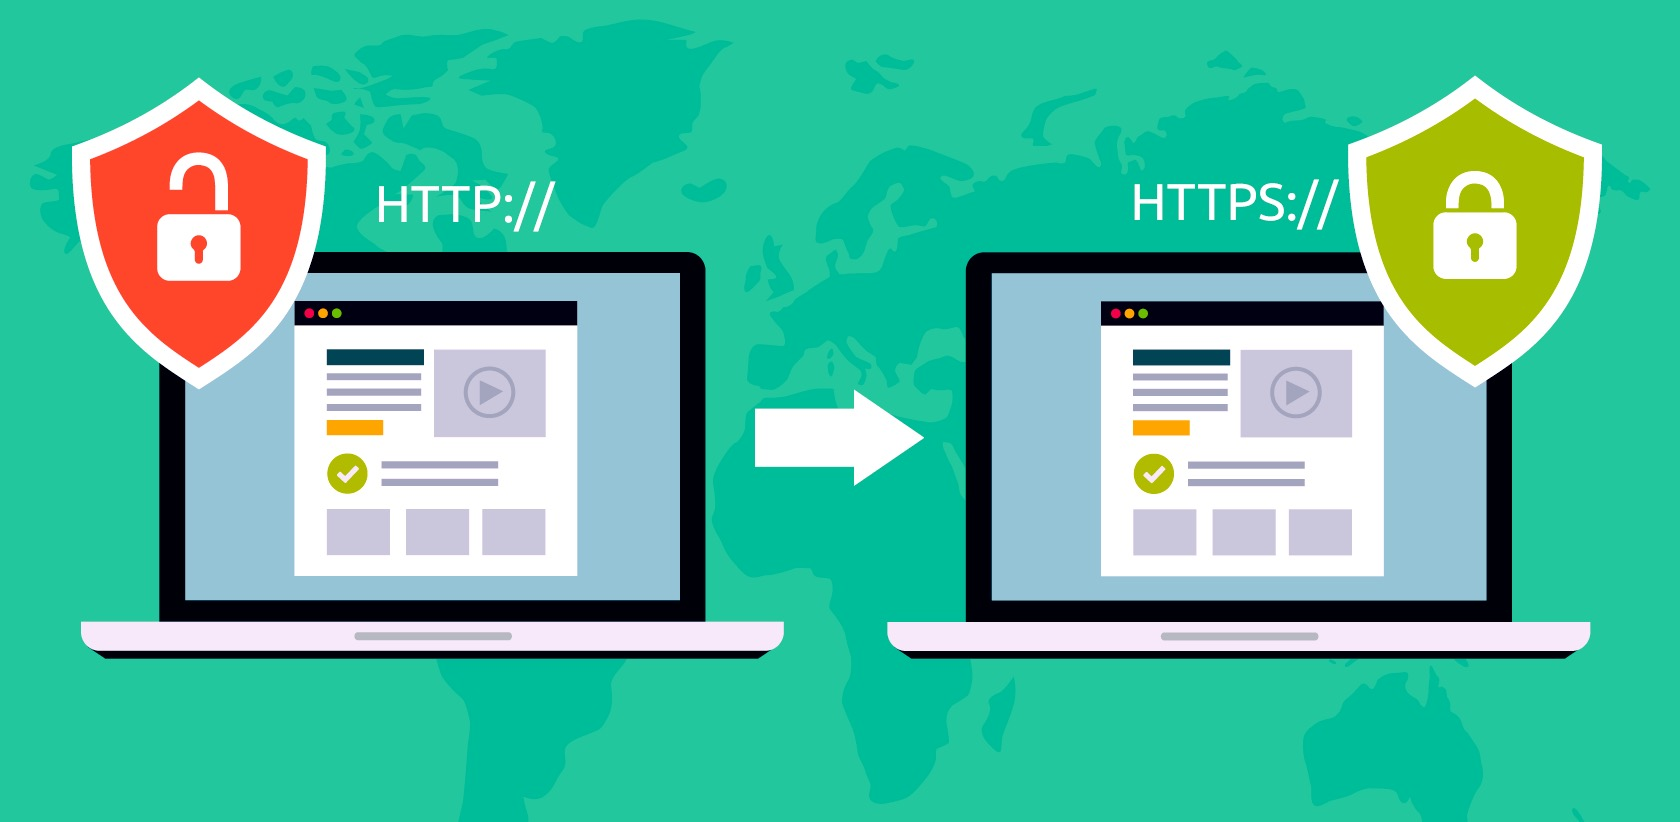 Secure Vs Not Secure Website